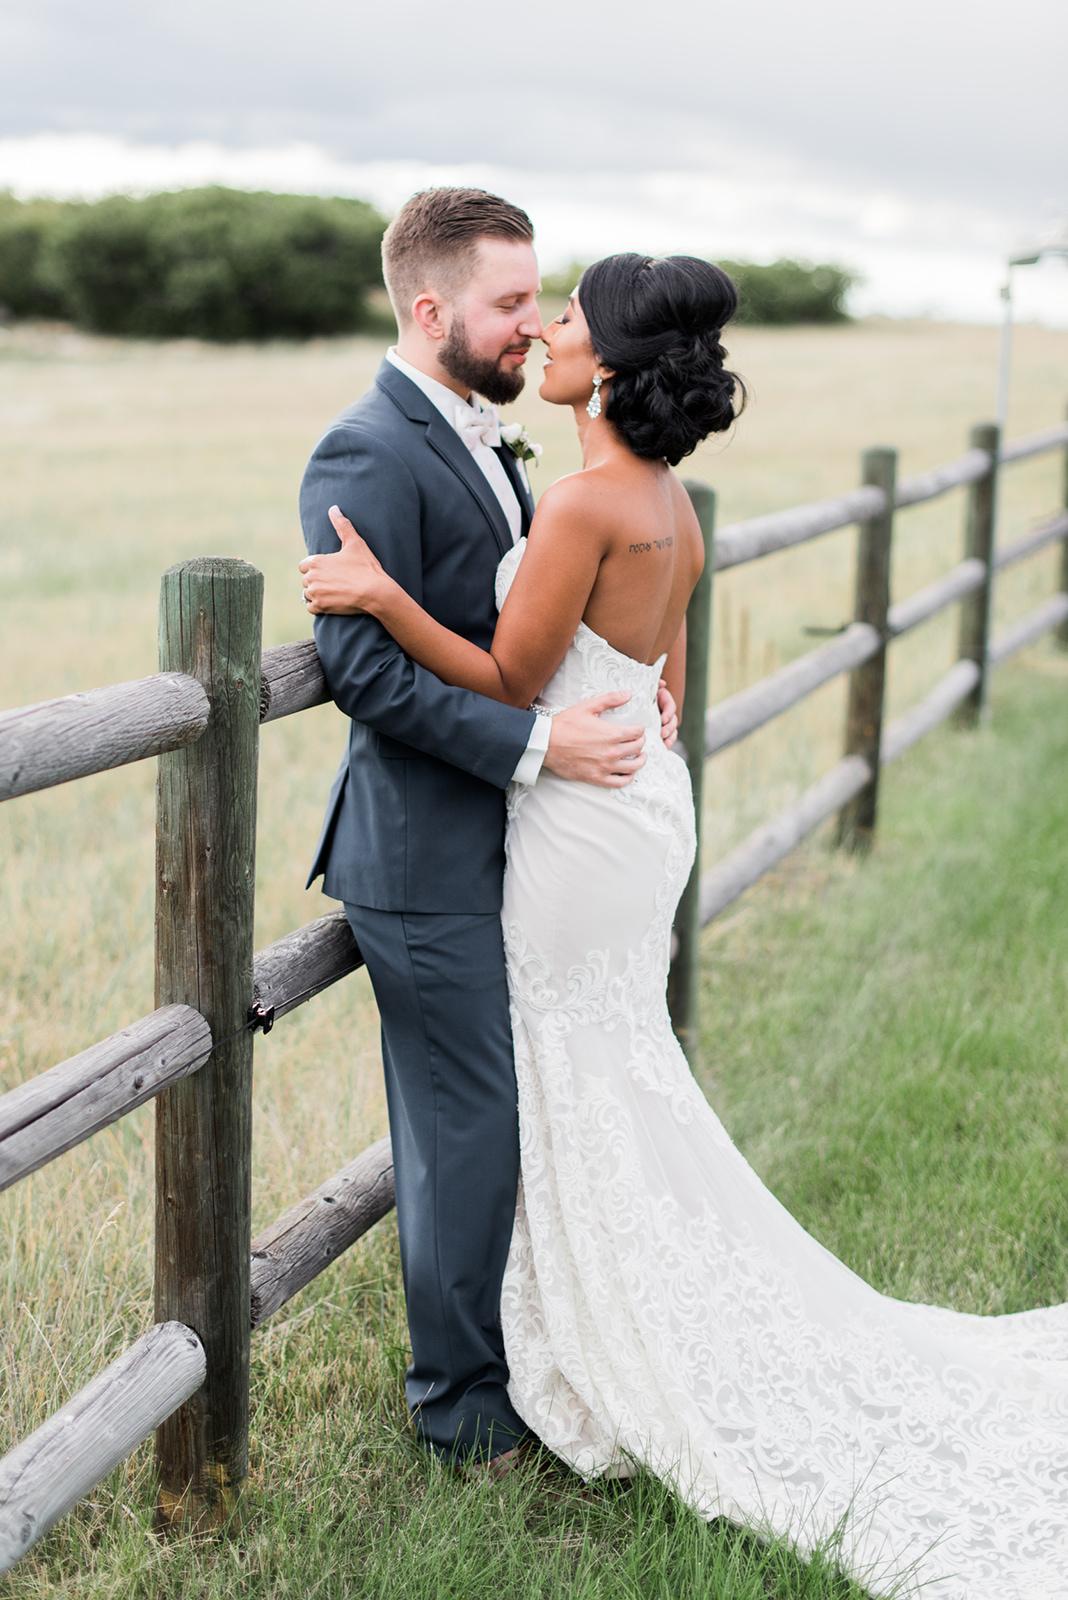 Portraits-Ranch-Denver-Colorado-Wedding-Photographer-129.jpg